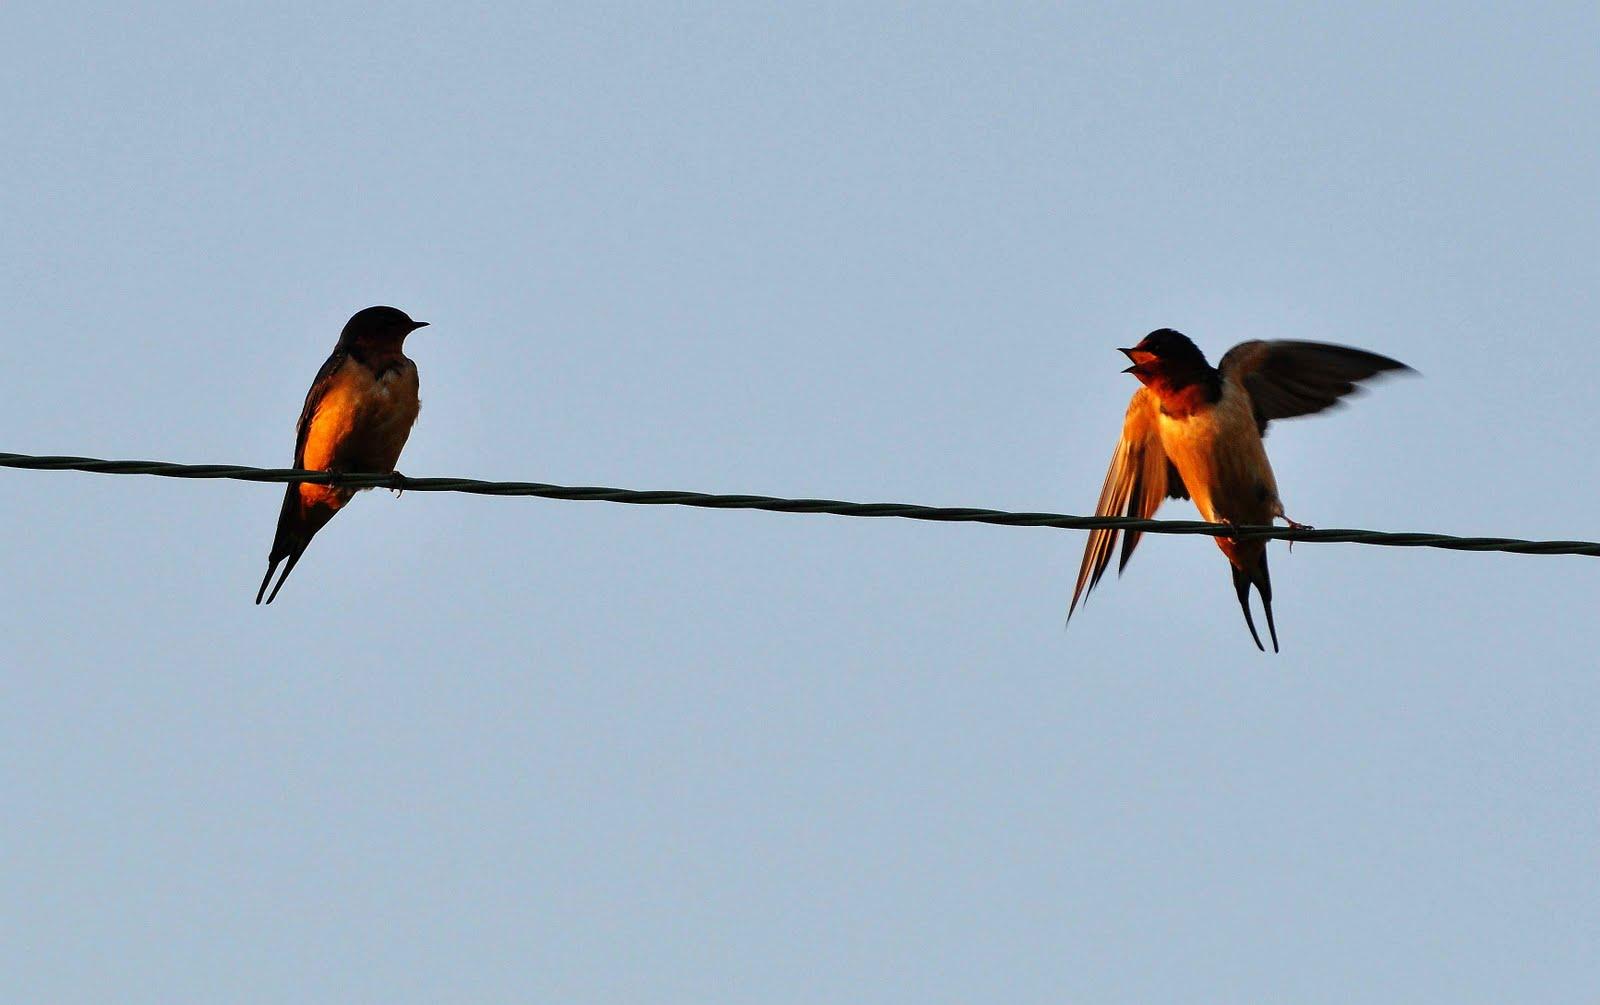 Nikon Sniper Barn Swallows Catching Bugs